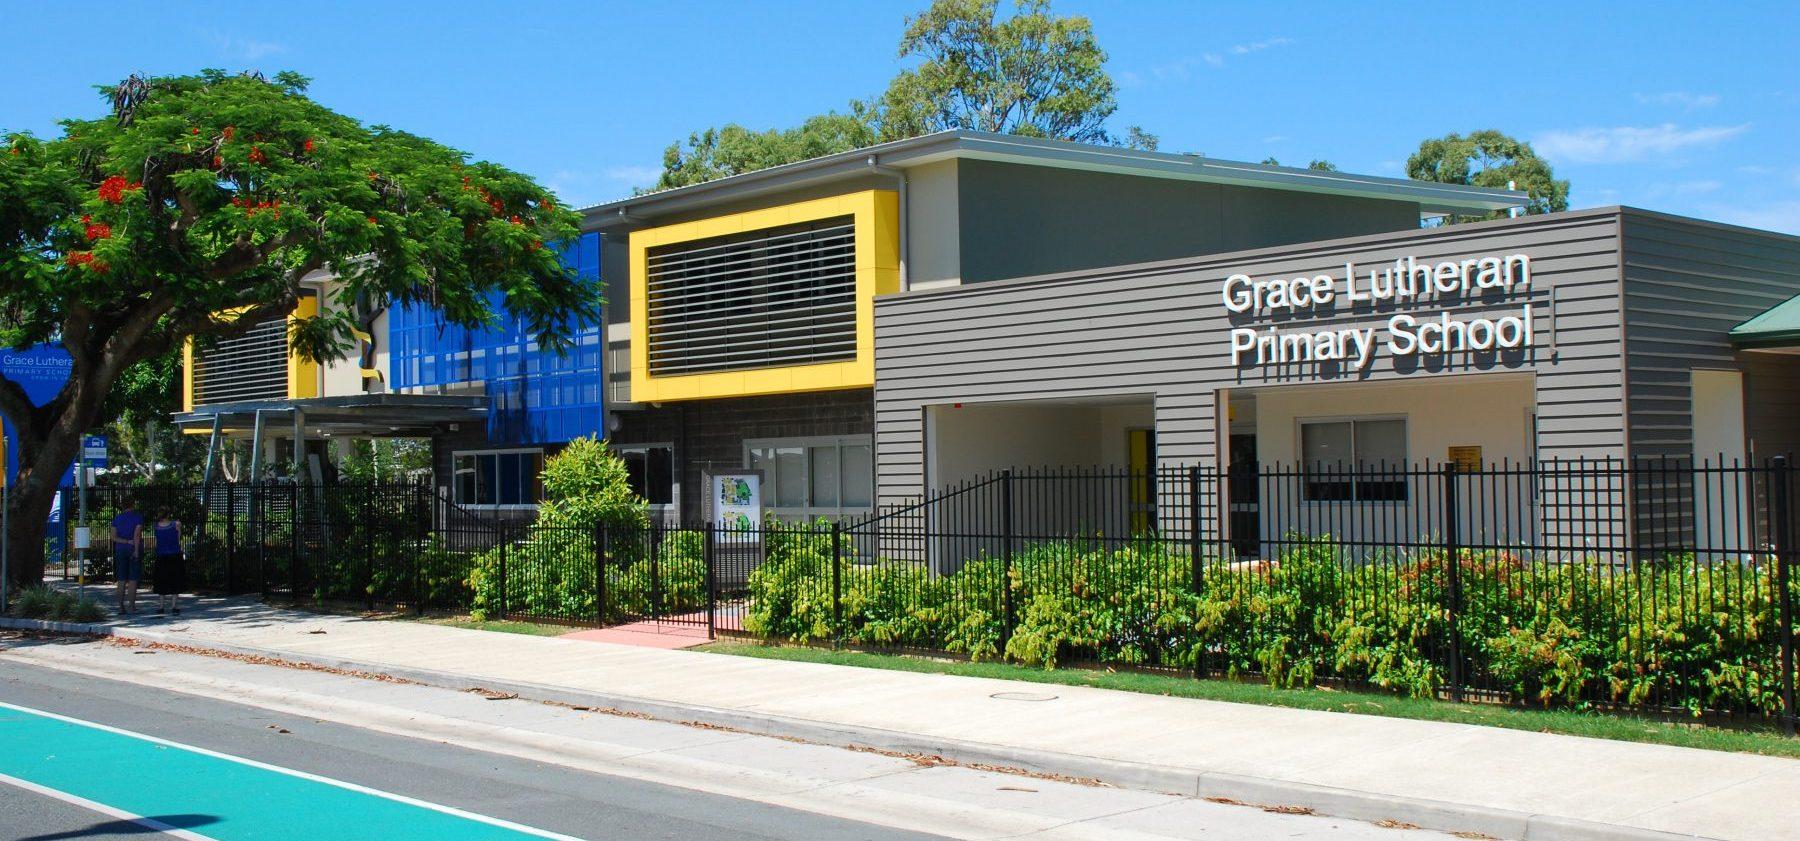 Grace Lutheran Primary School External